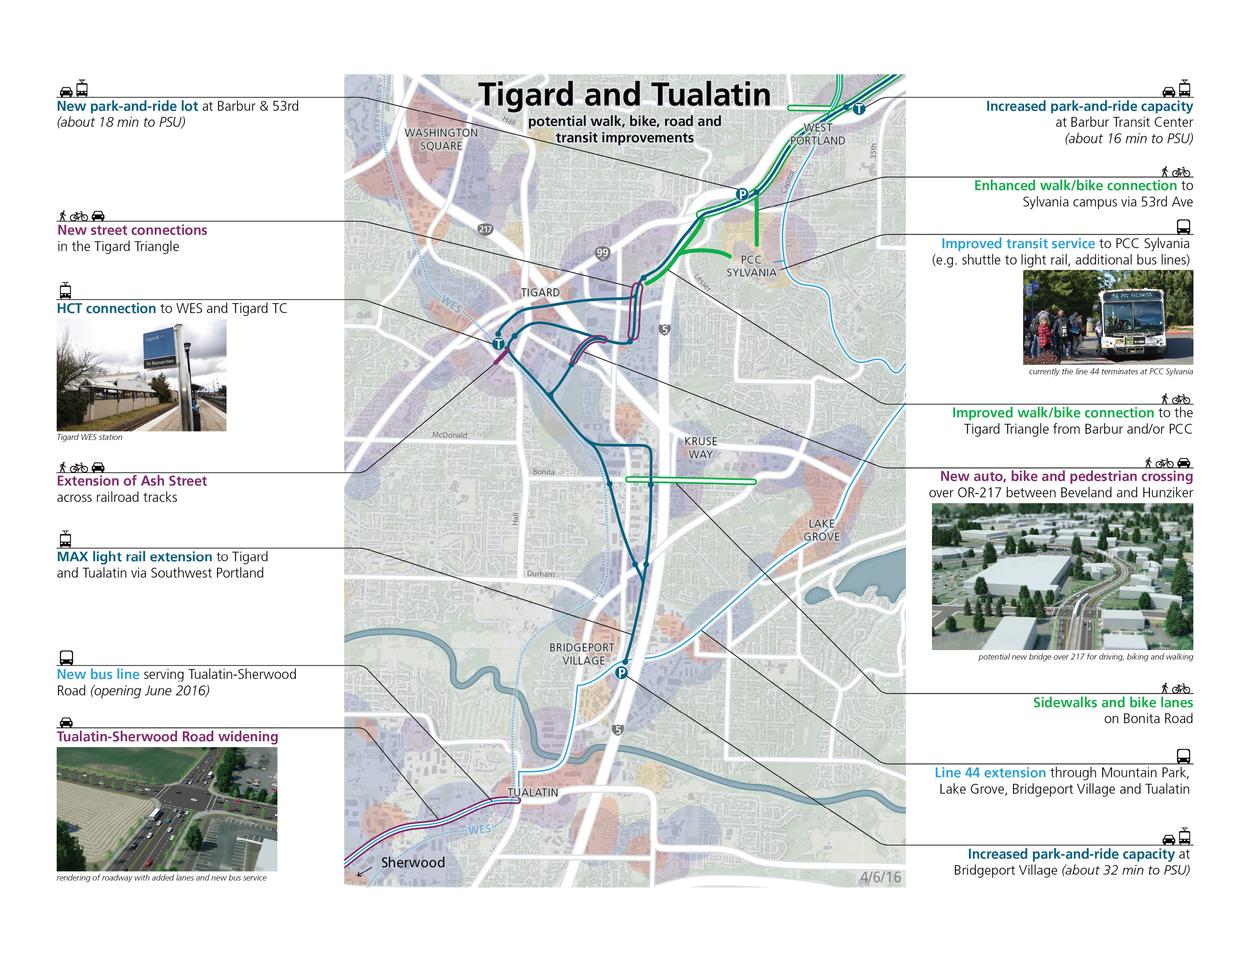 Potential walking, biking, road and transit improvements in Tigard and Tualatin